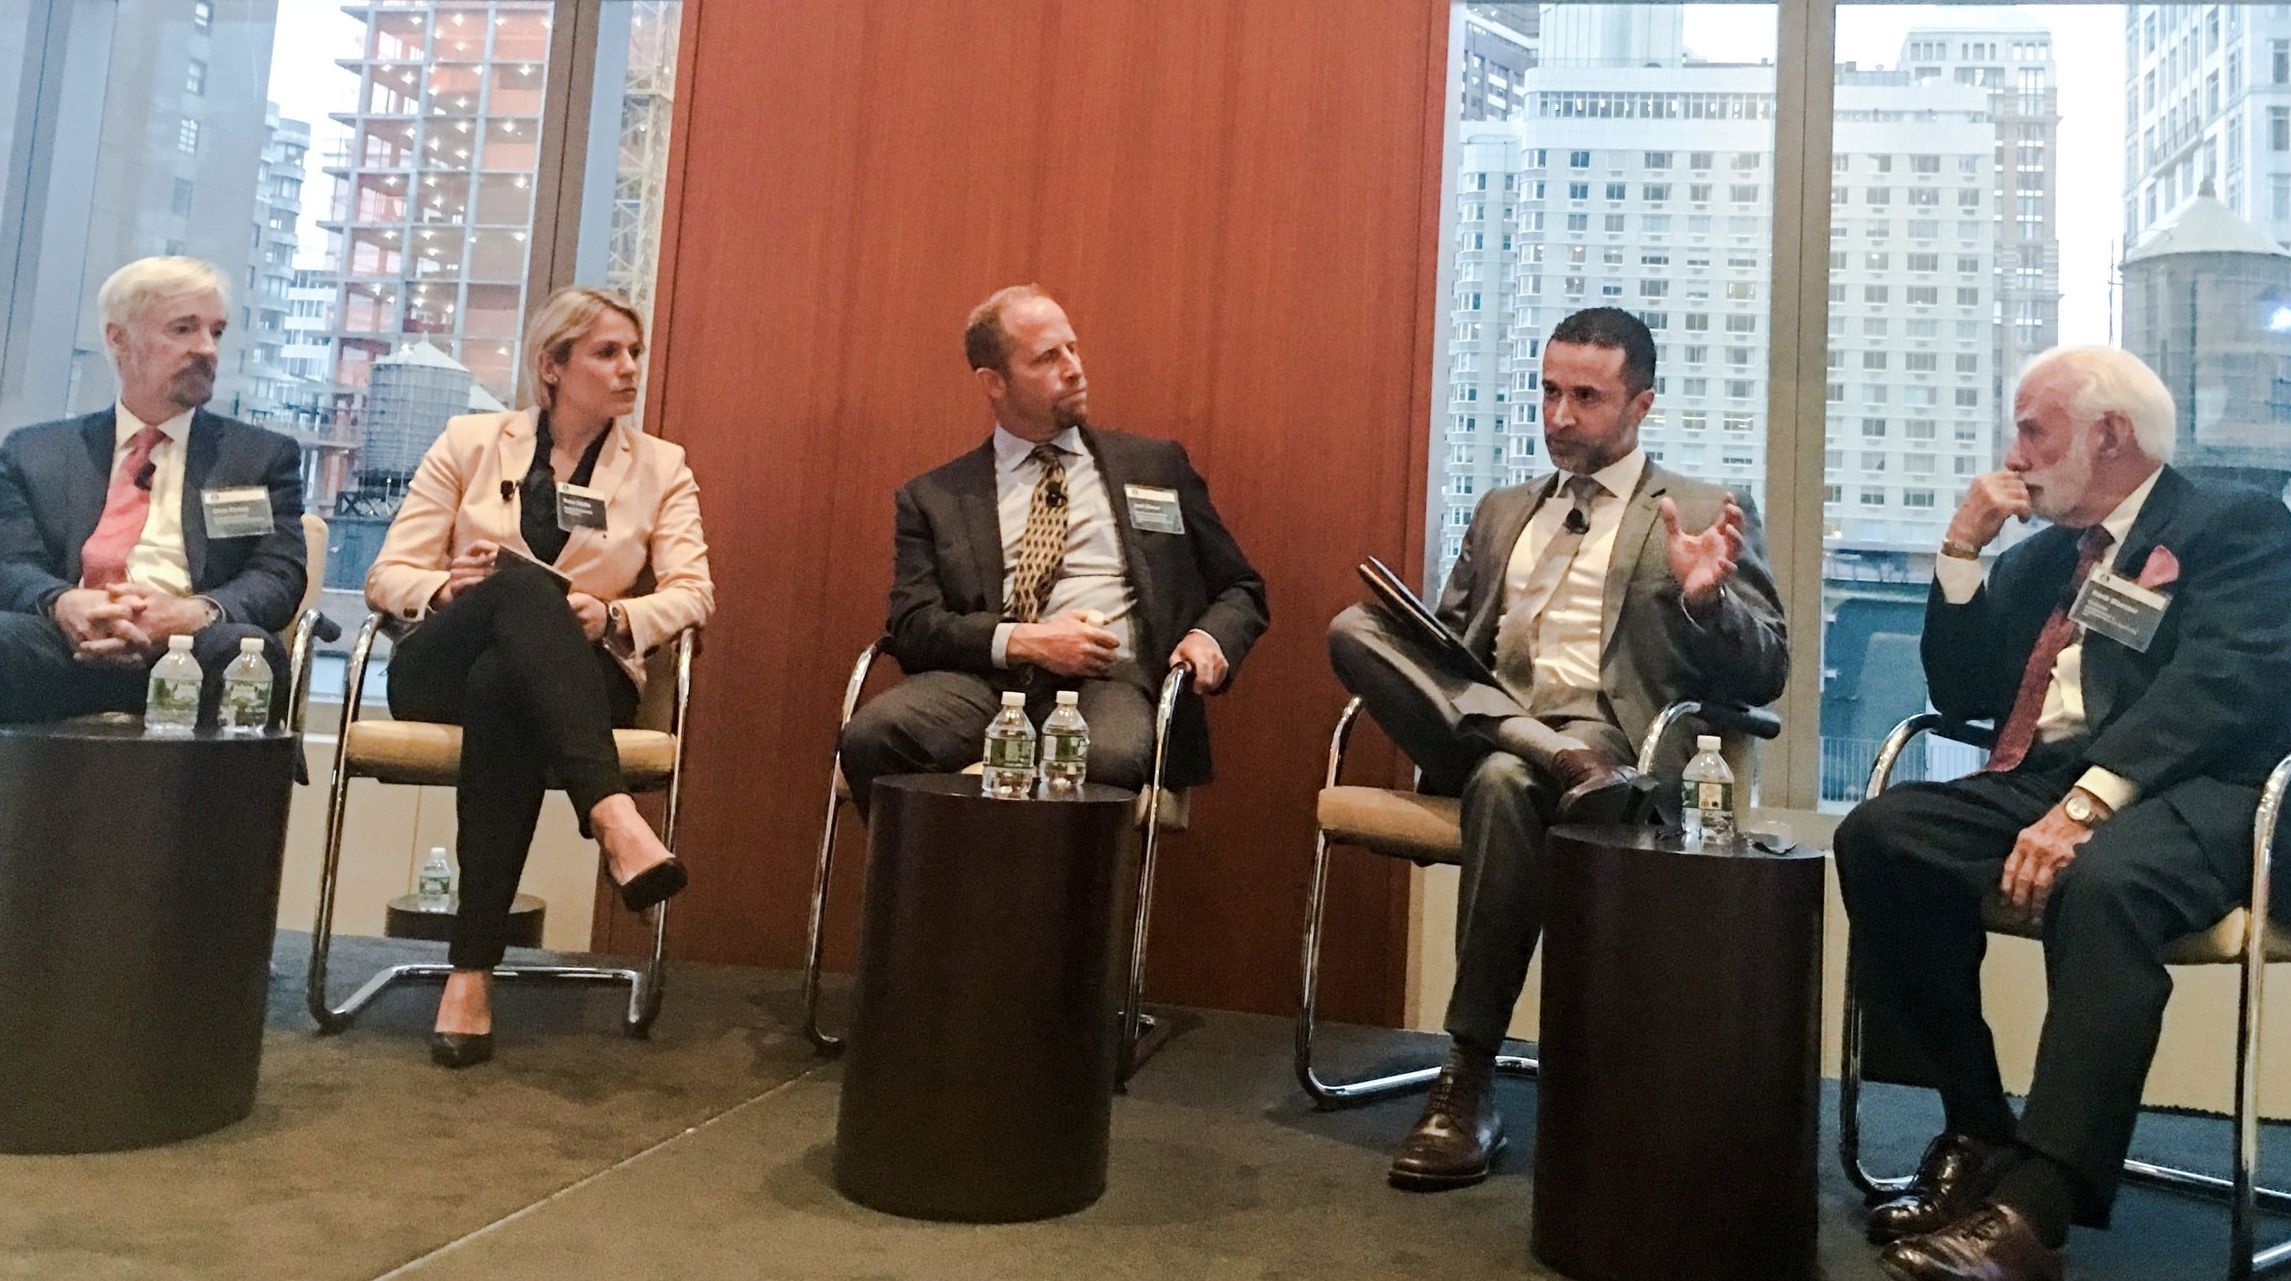 Claudio Rojas Hurt Capital 21st Century Company and Corporate Governance Skytop Strategies.jpg